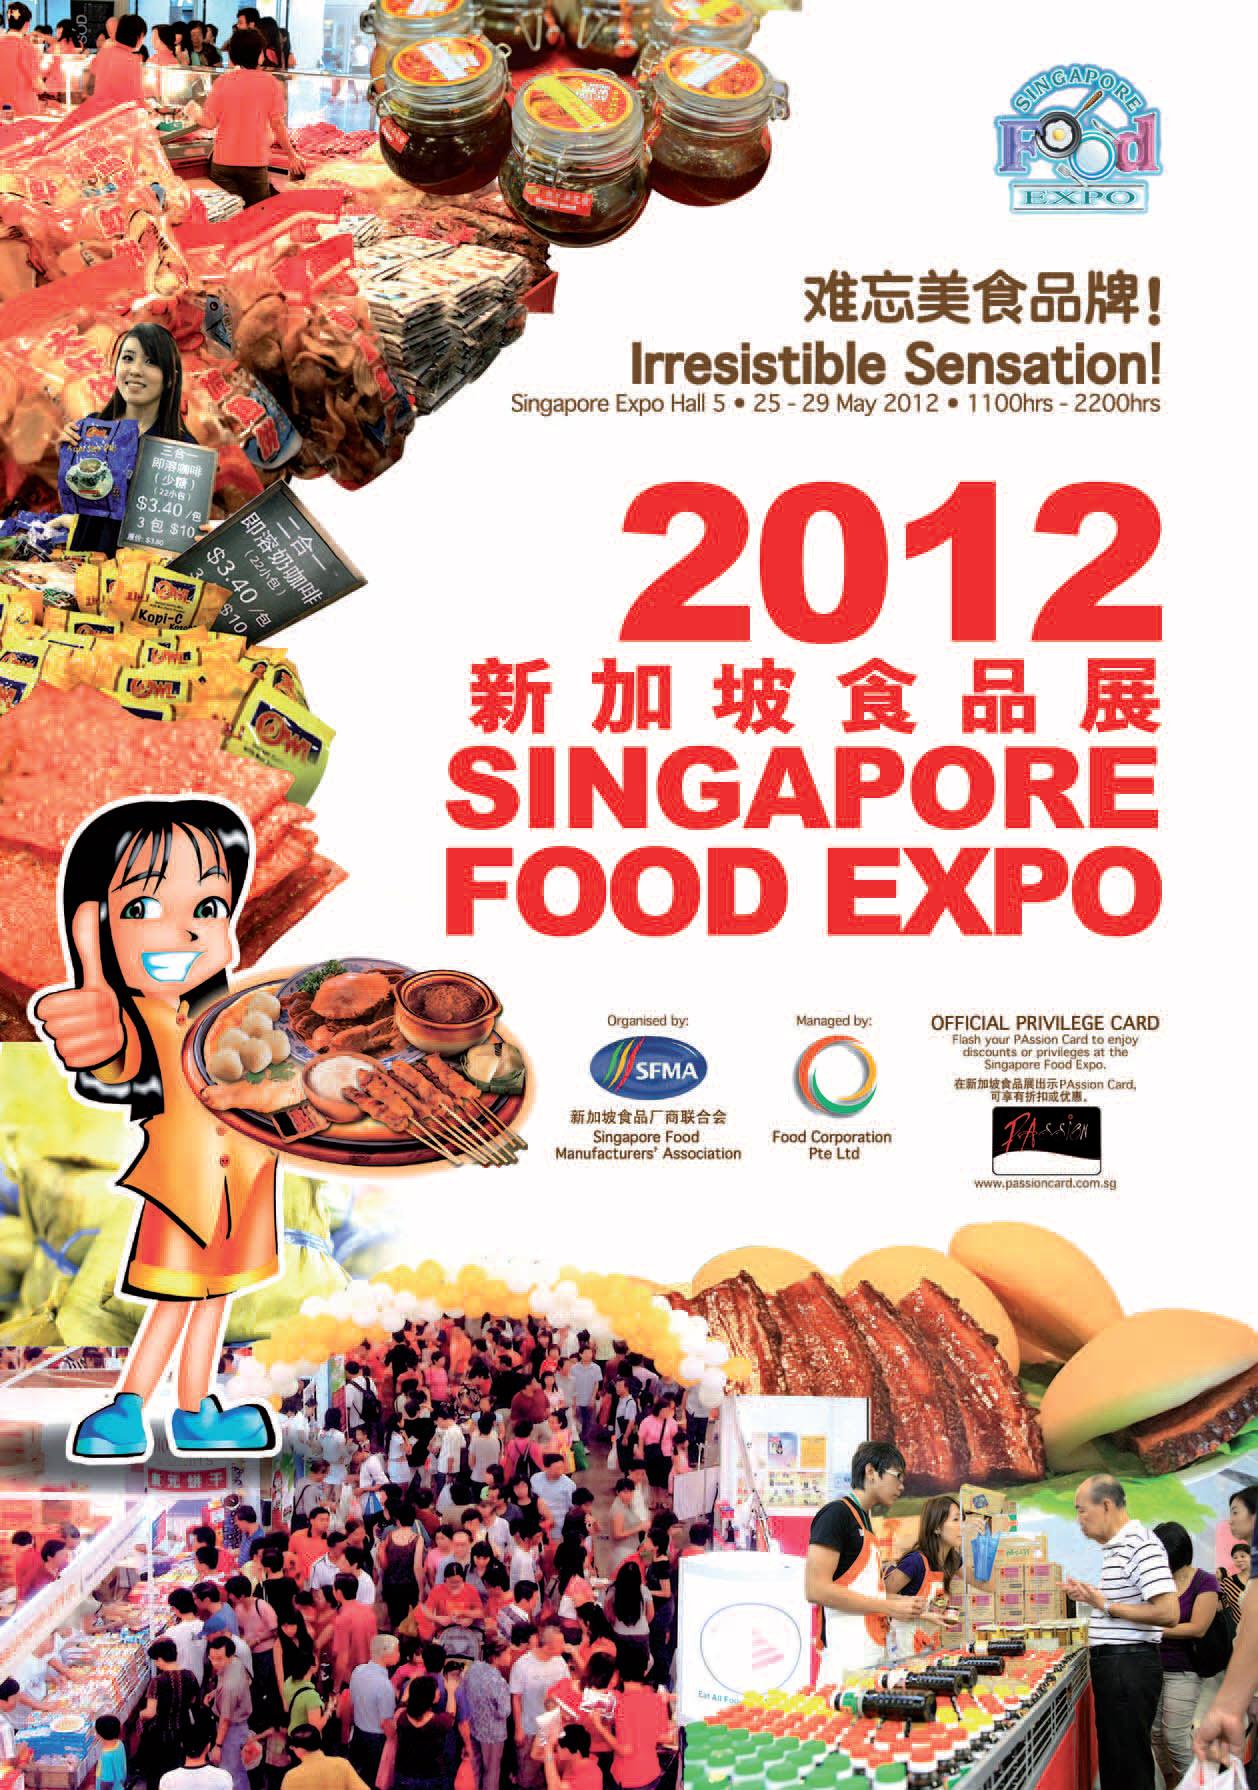 Singapore Food Expo 2012 Simply Sensational